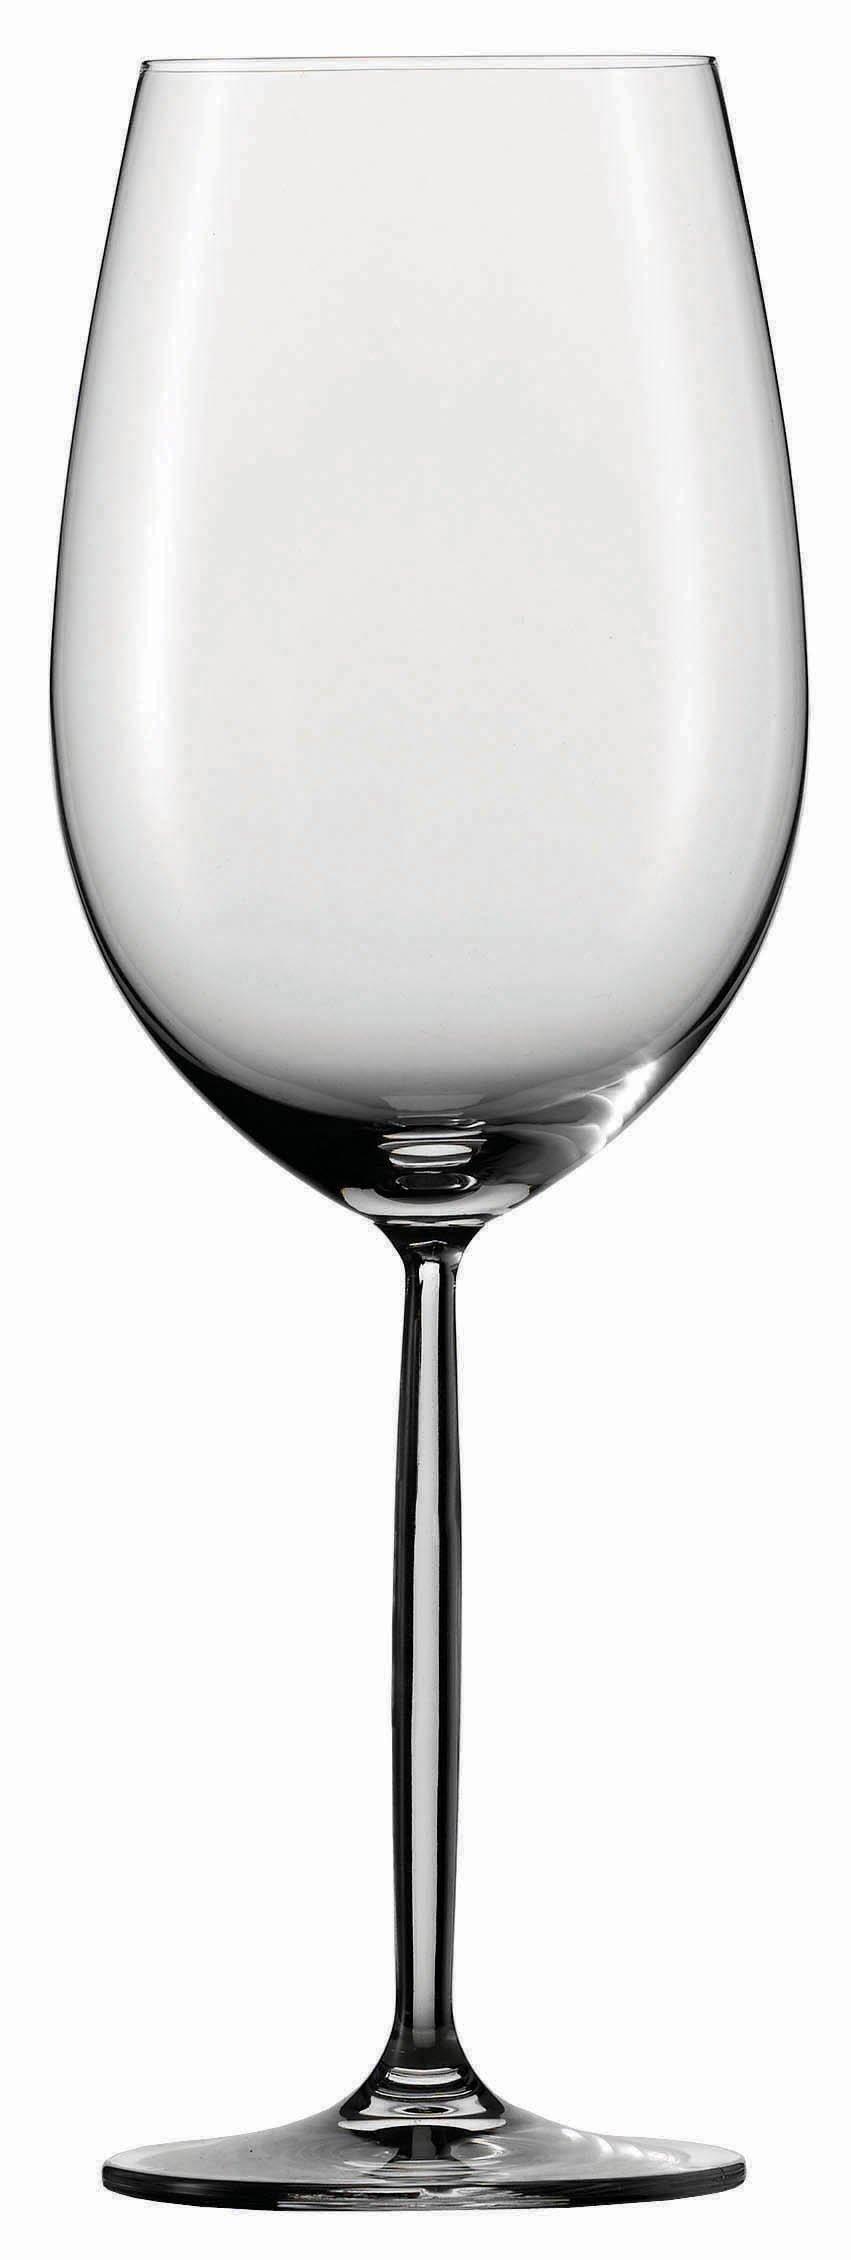 Schott Zwiesel Tritan Crystal Glass Diva Stemware Collection Claret/Bordeaux Goblet, Red Wine Glass, 26-Ounce, Set of 6